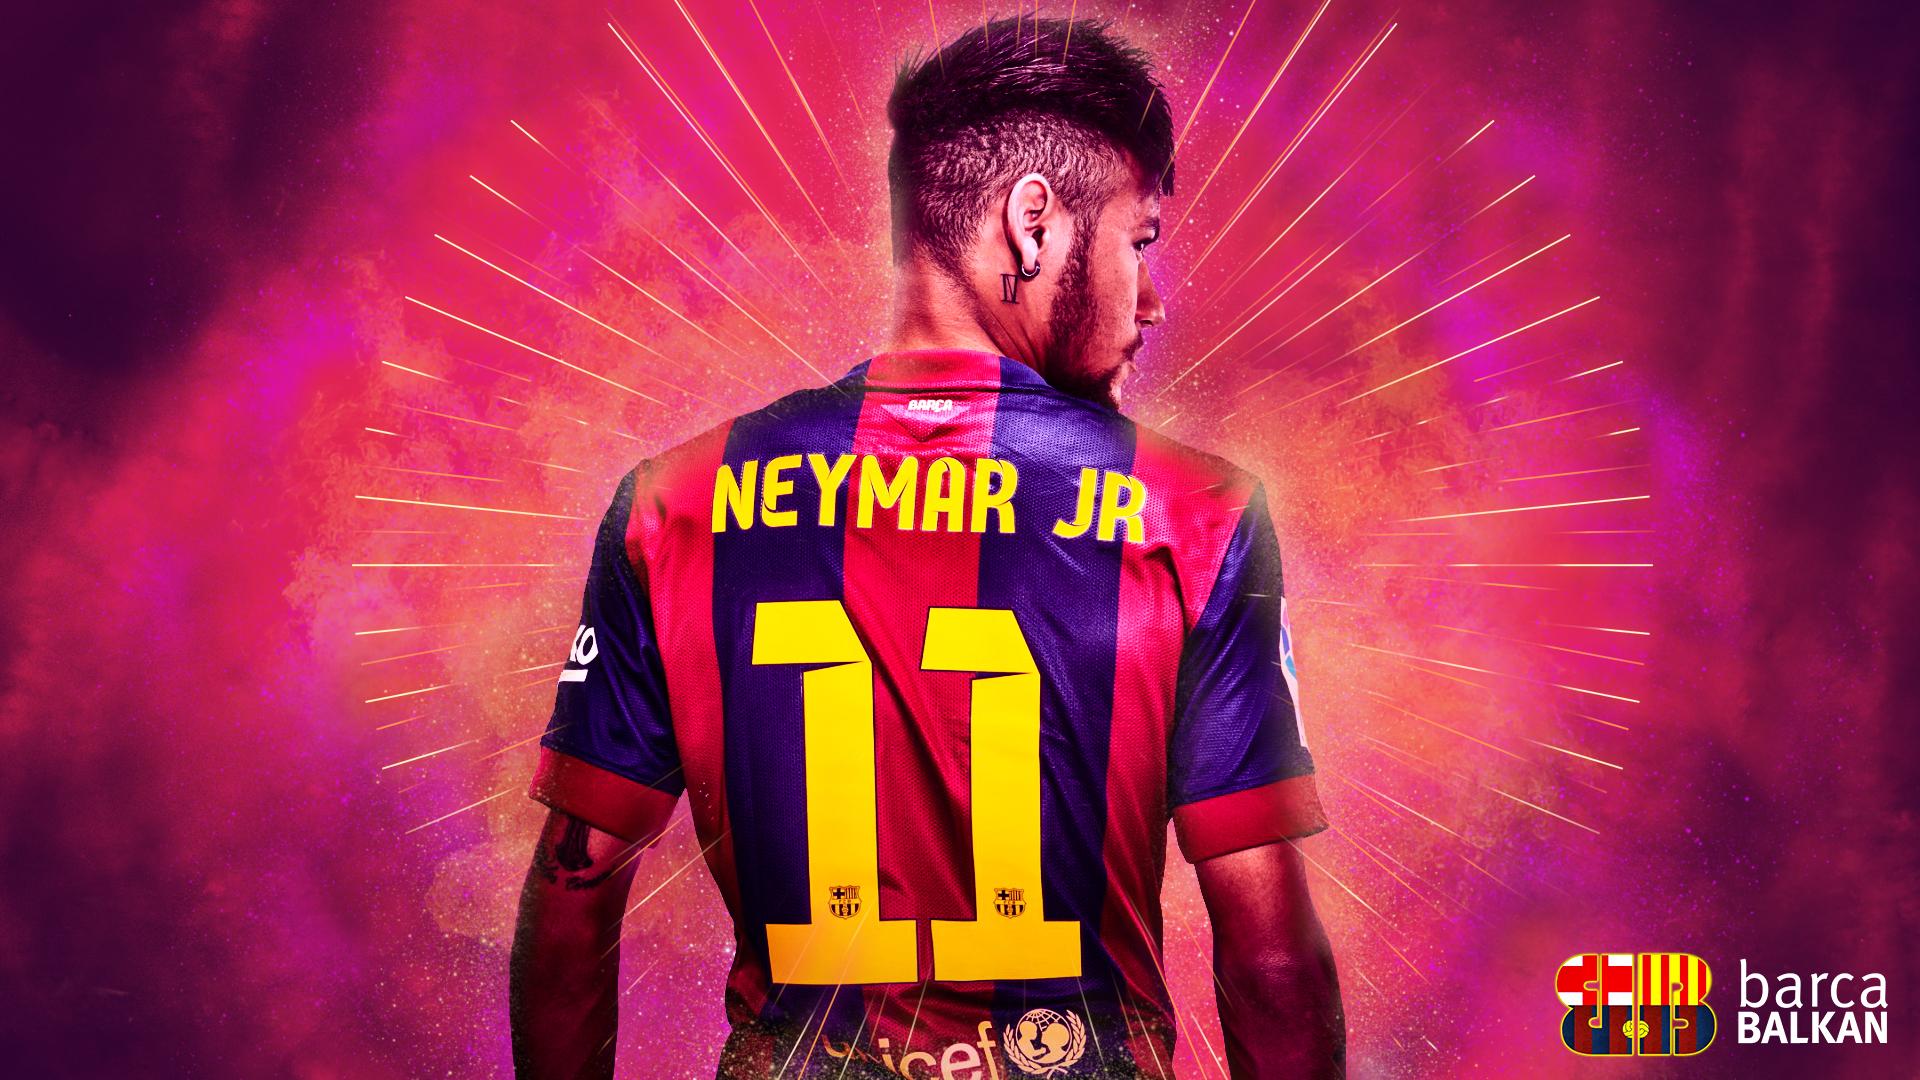 Neymar Jr Wallpaper Hd Wallpapersafari